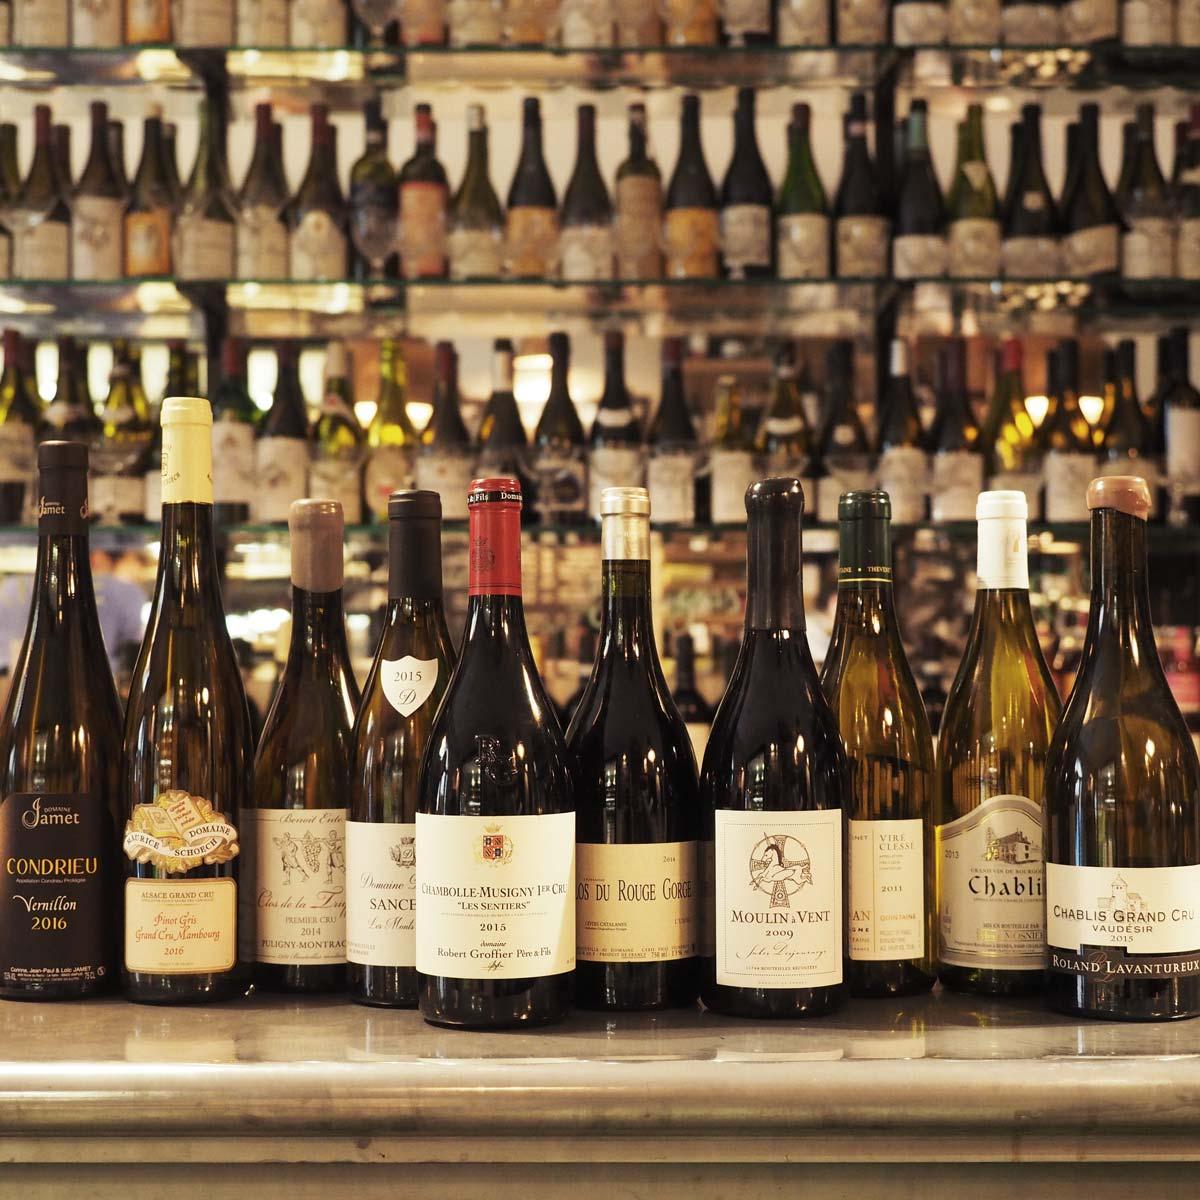 Enoteca al Risanamento vini francesi